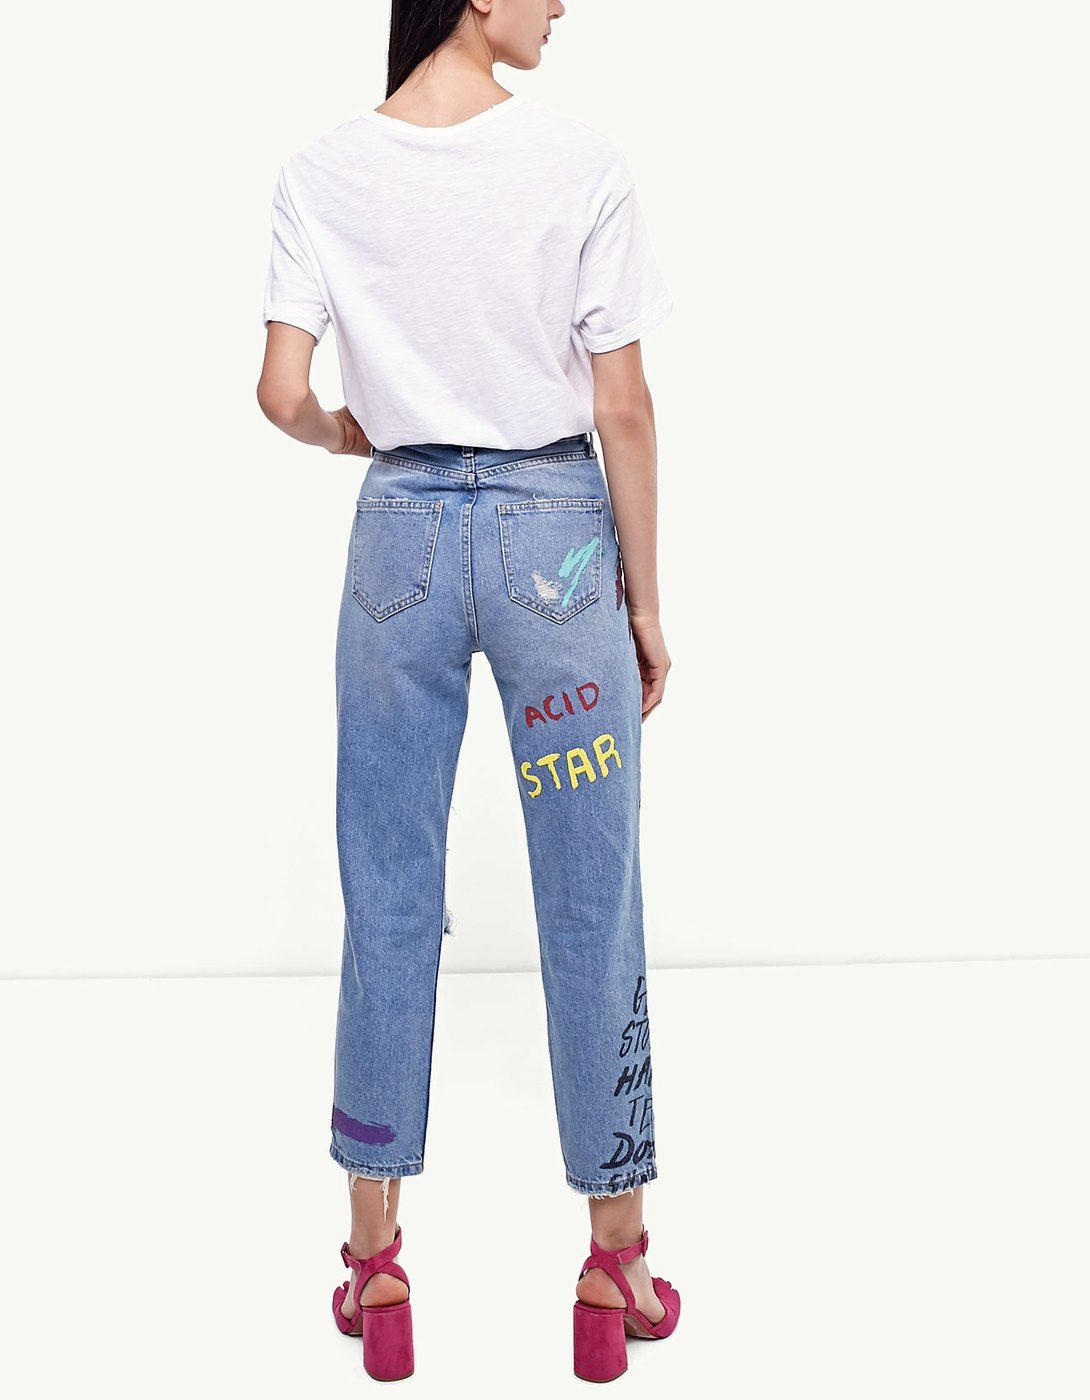 Jeans straight graffiti - Jeans  ae2256d956a